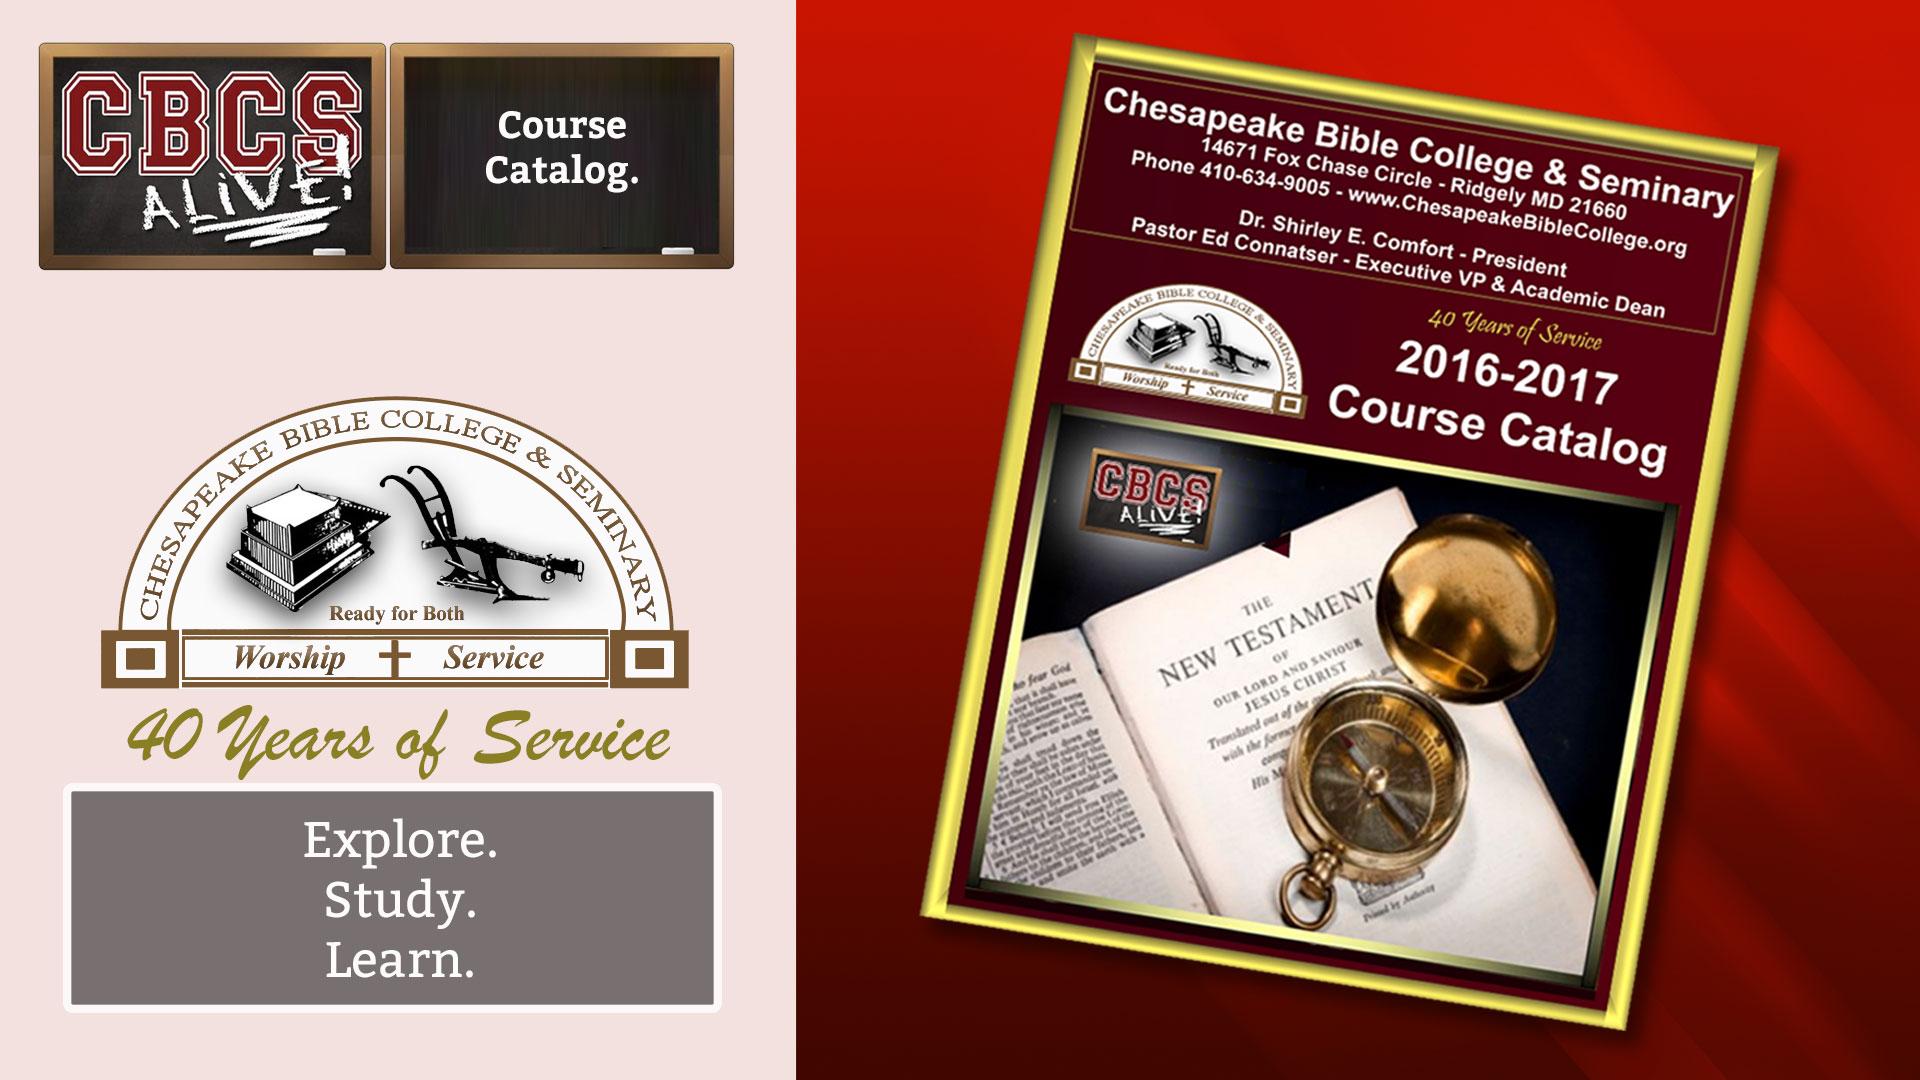 Chesapeake Bible College & Seminary Course Catalog